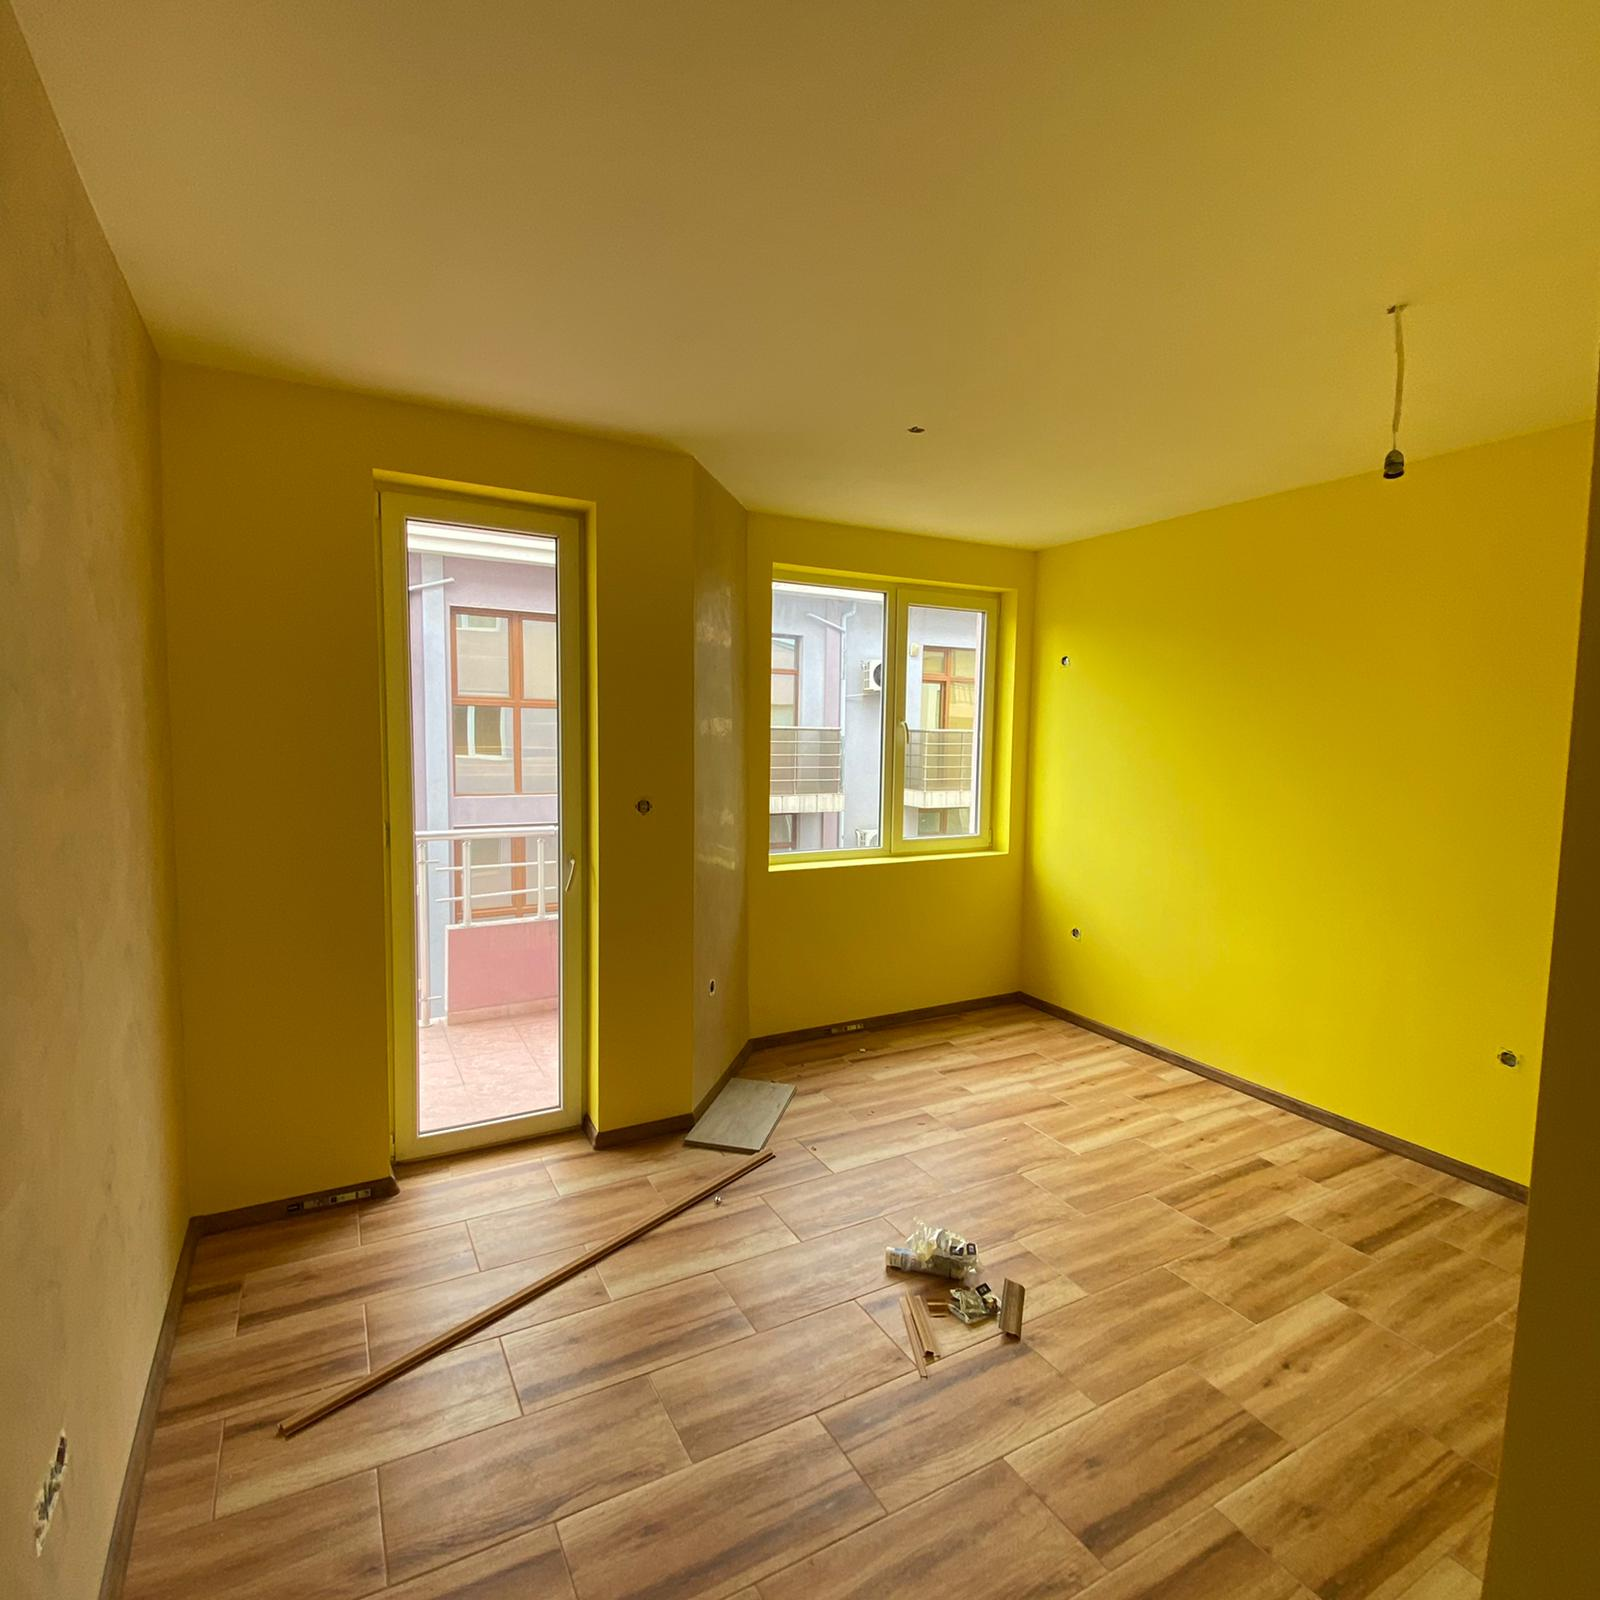 Продава: Светъл апартамент в красив район в Свети Влас.